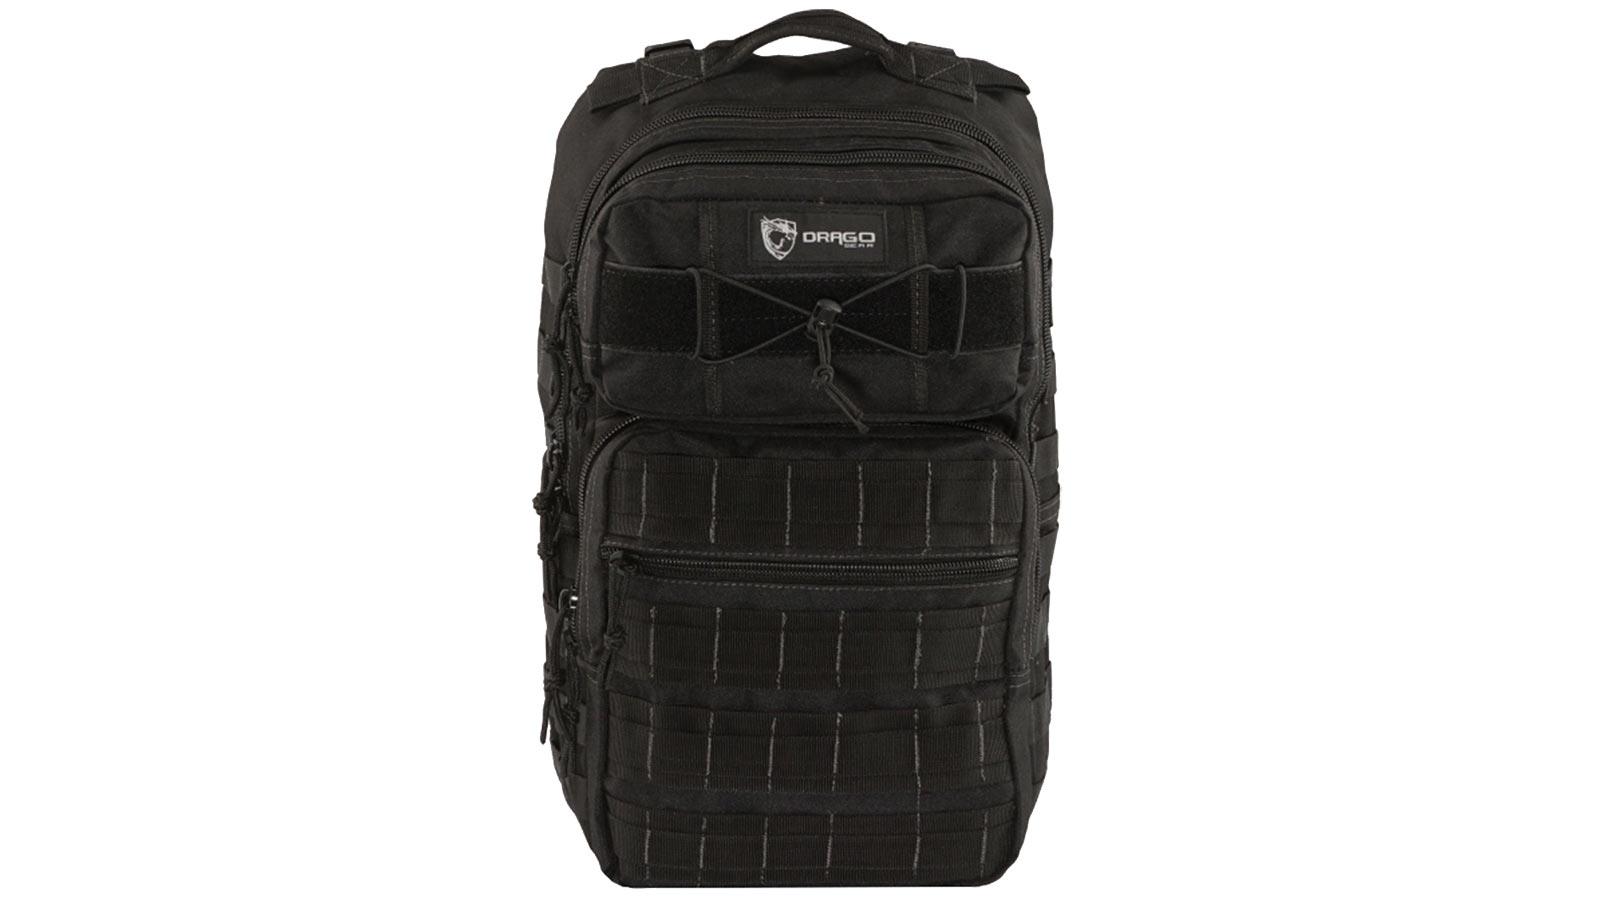 Drago Ranger Laptop Backpack Black